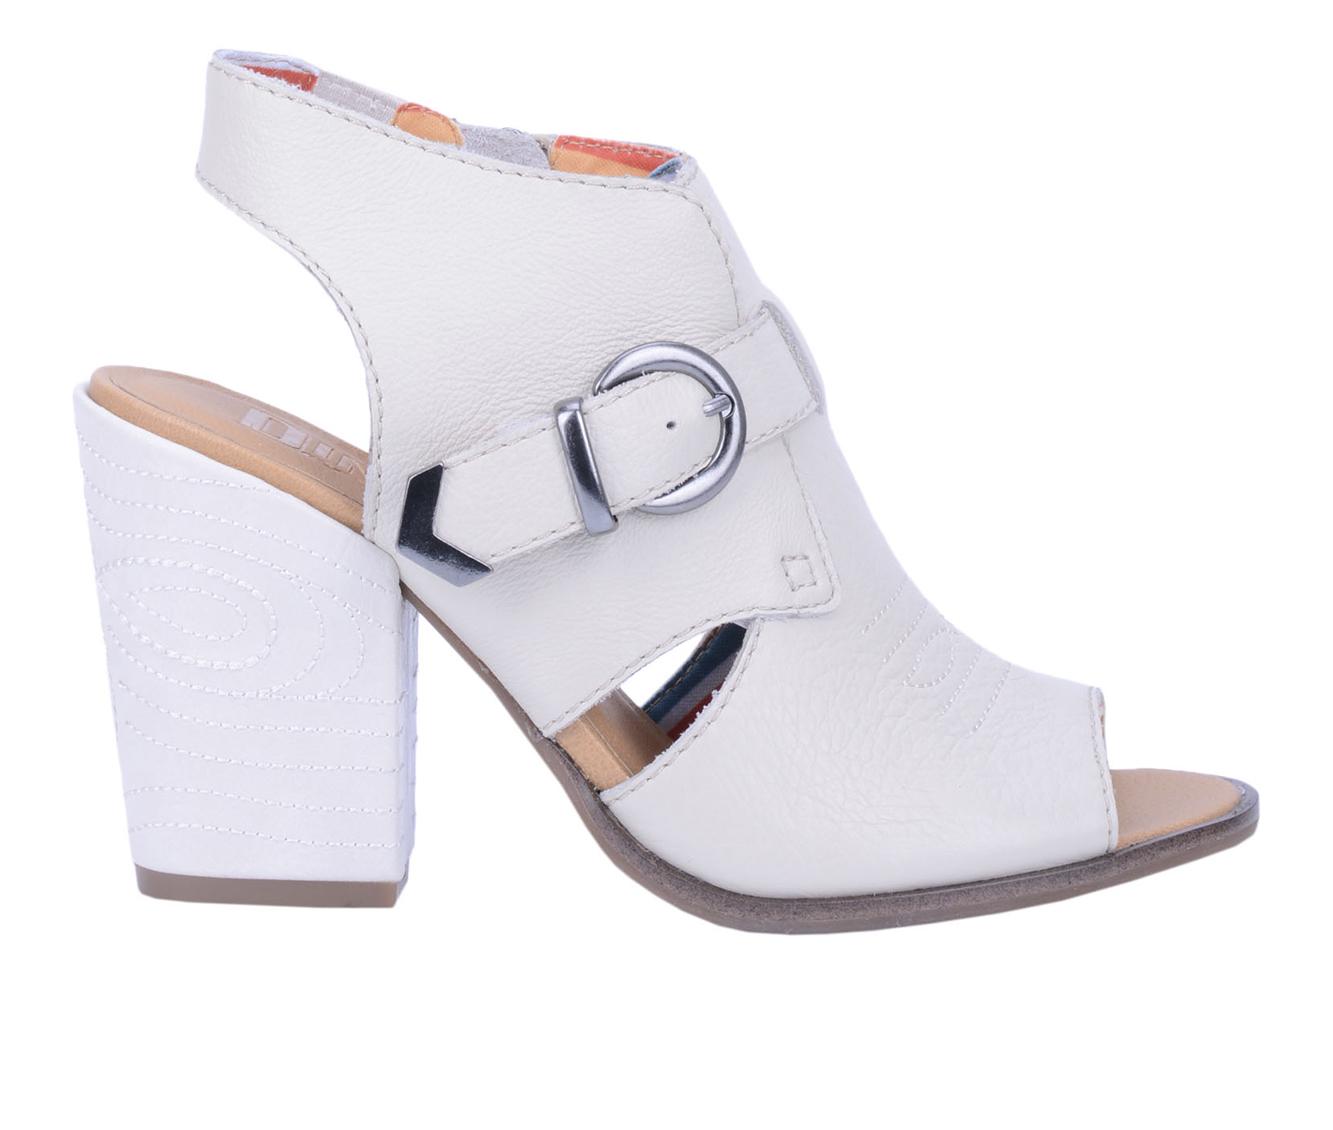 Dingo Boots Stirrup Women's Dress Shoe (White - Leather)